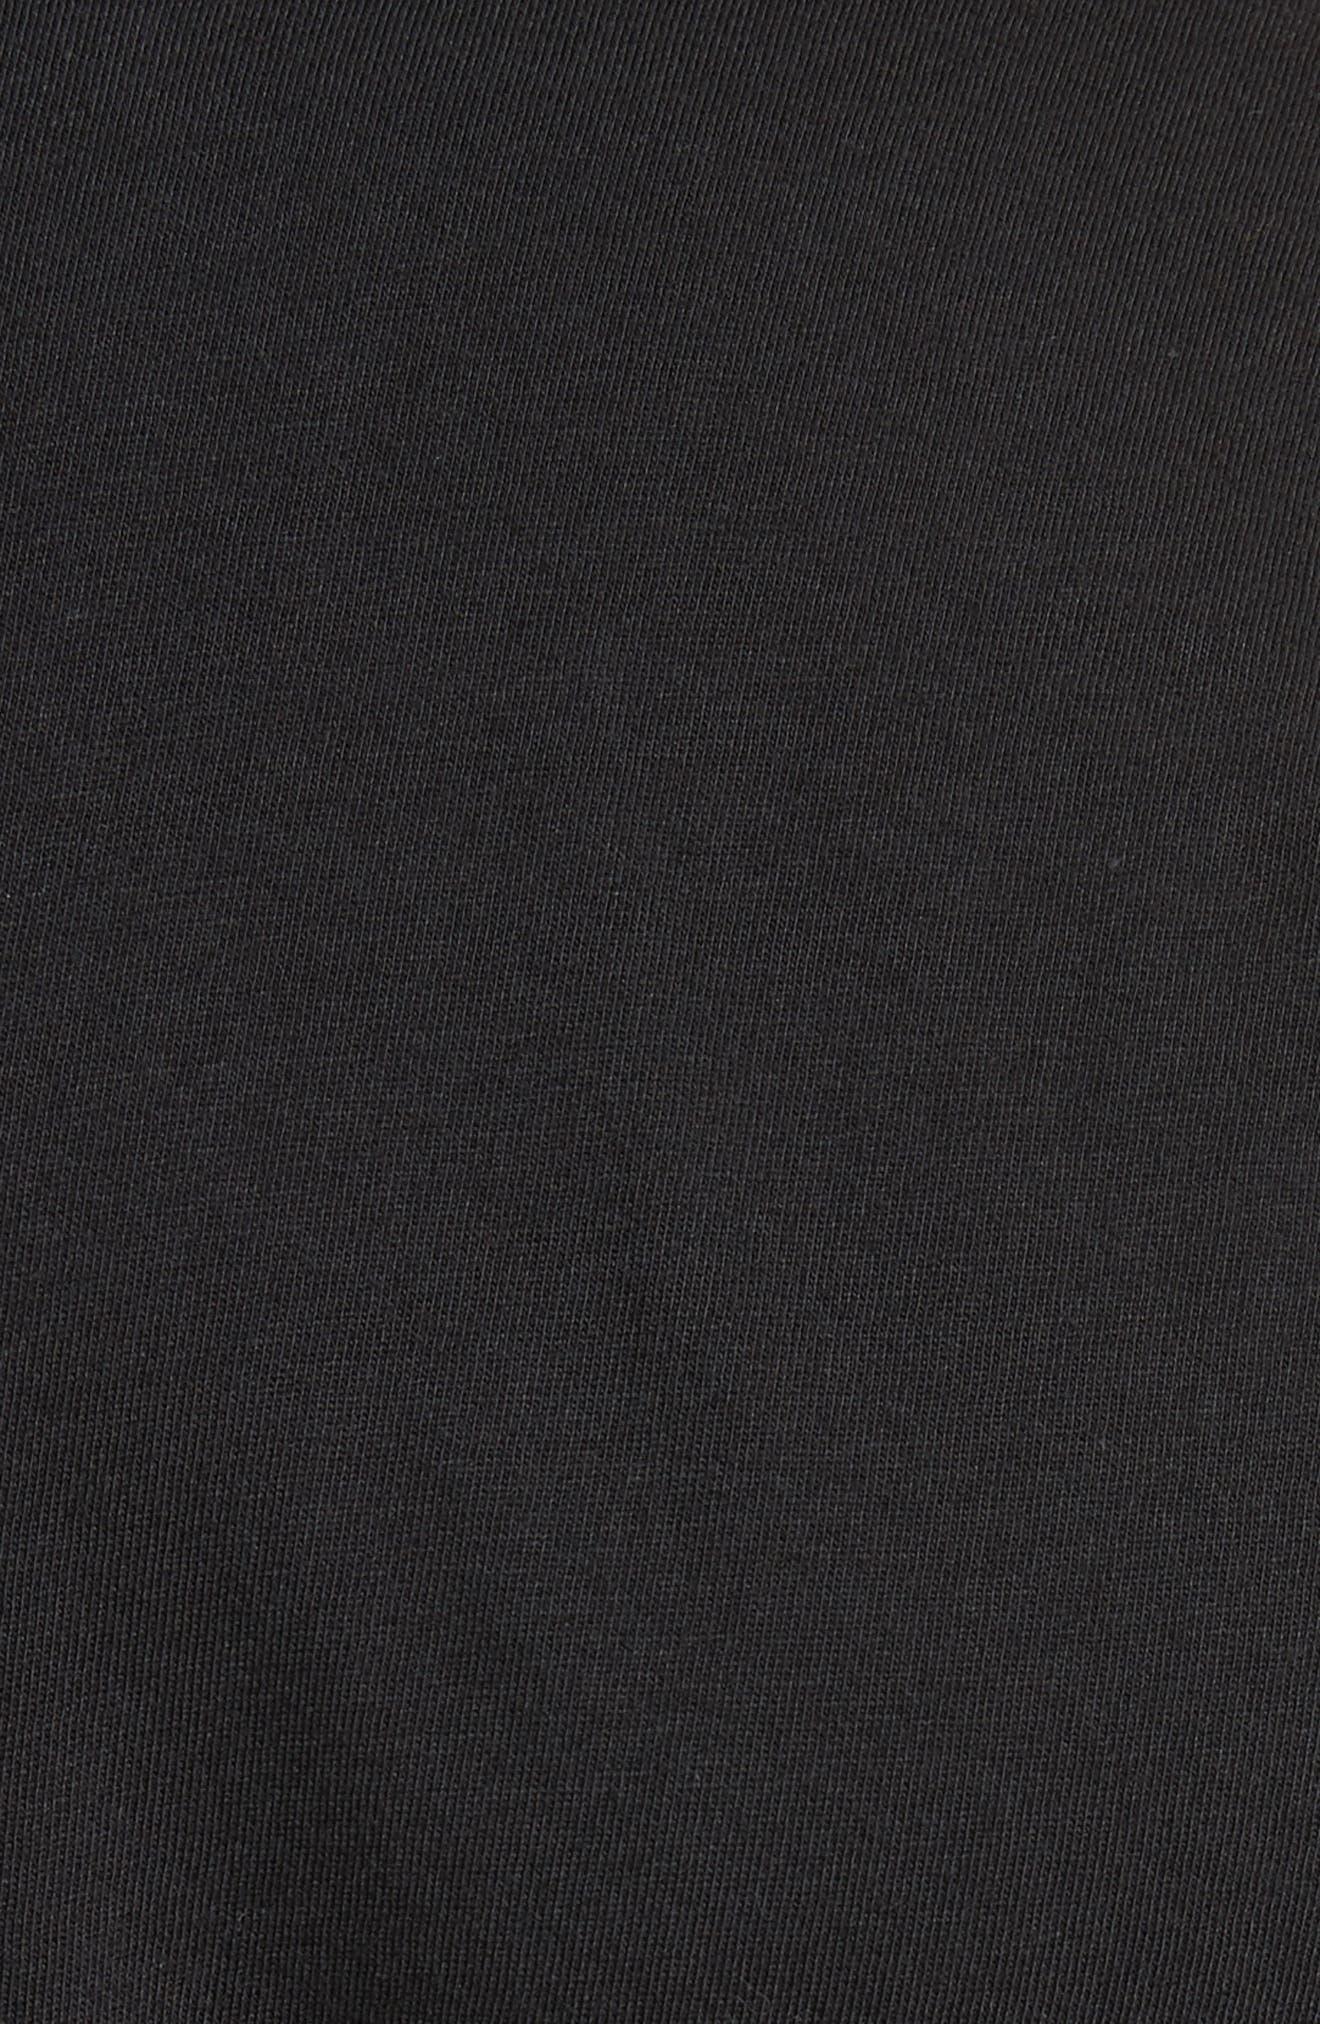 Sunset Graphic Long Sleeve T-Shirt,                             Alternate thumbnail 5, color,                             001